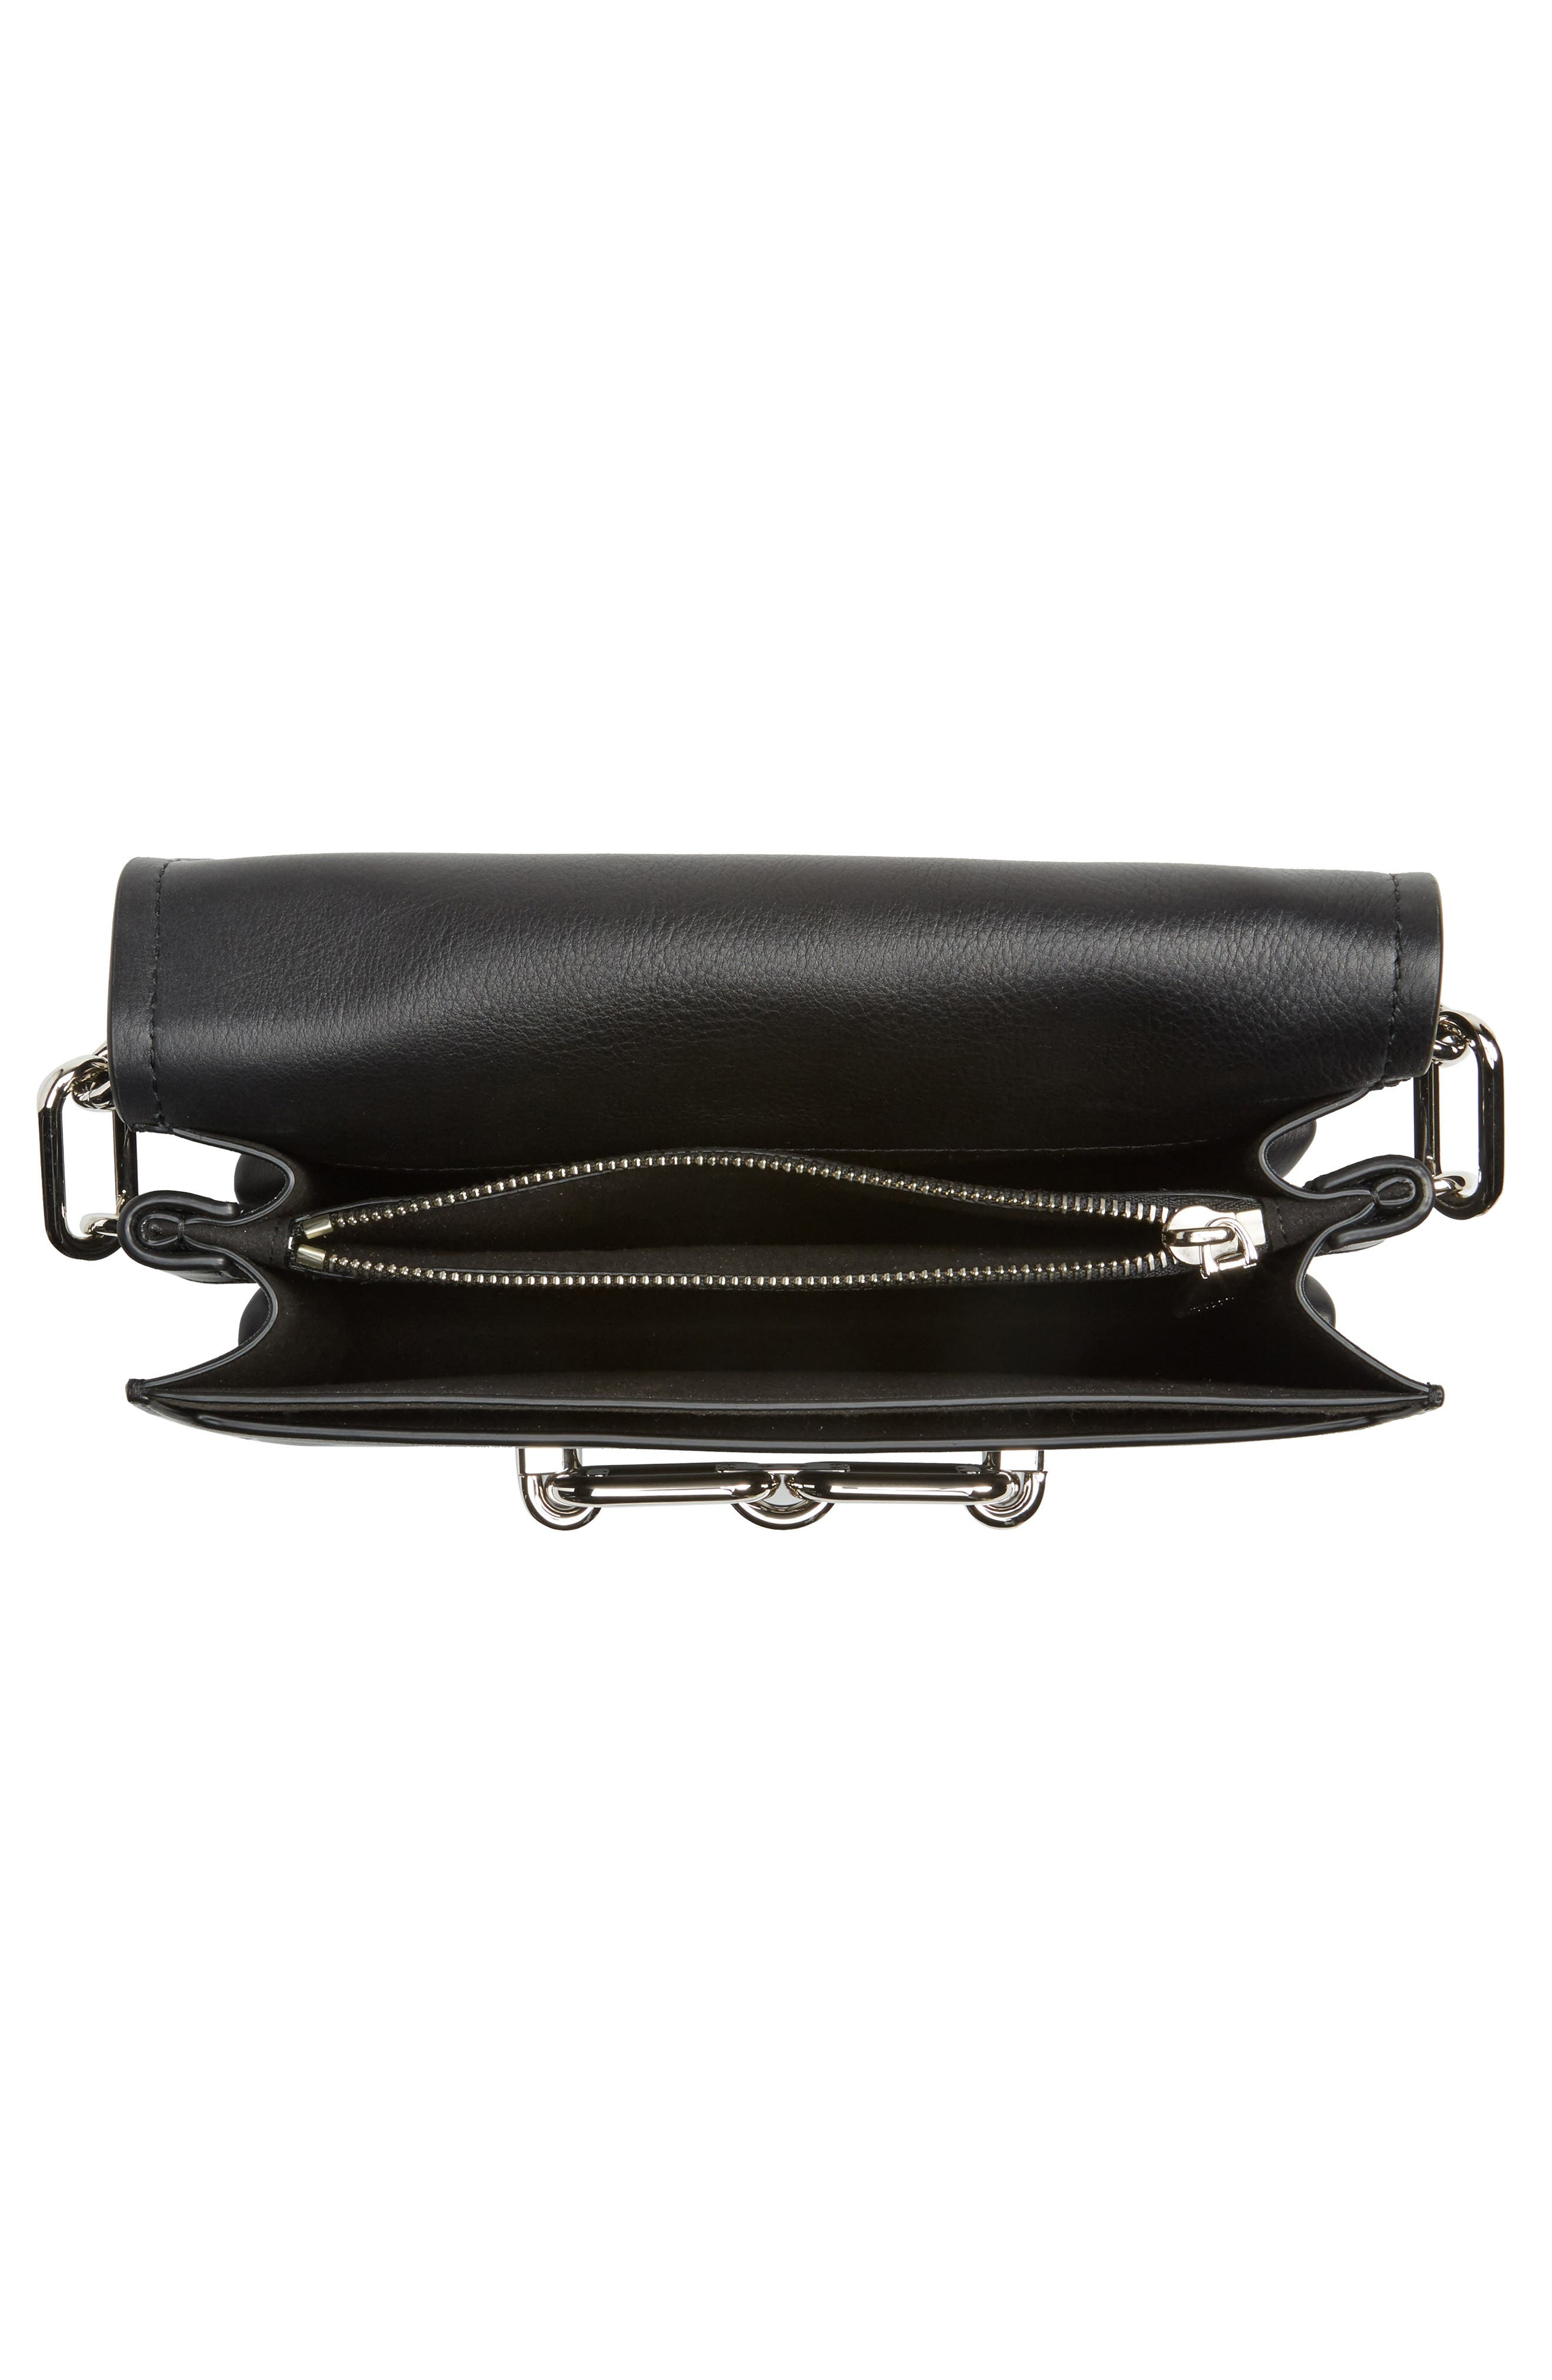 Medium Shoulder Bag,                             Alternate thumbnail 3, color,                             Black